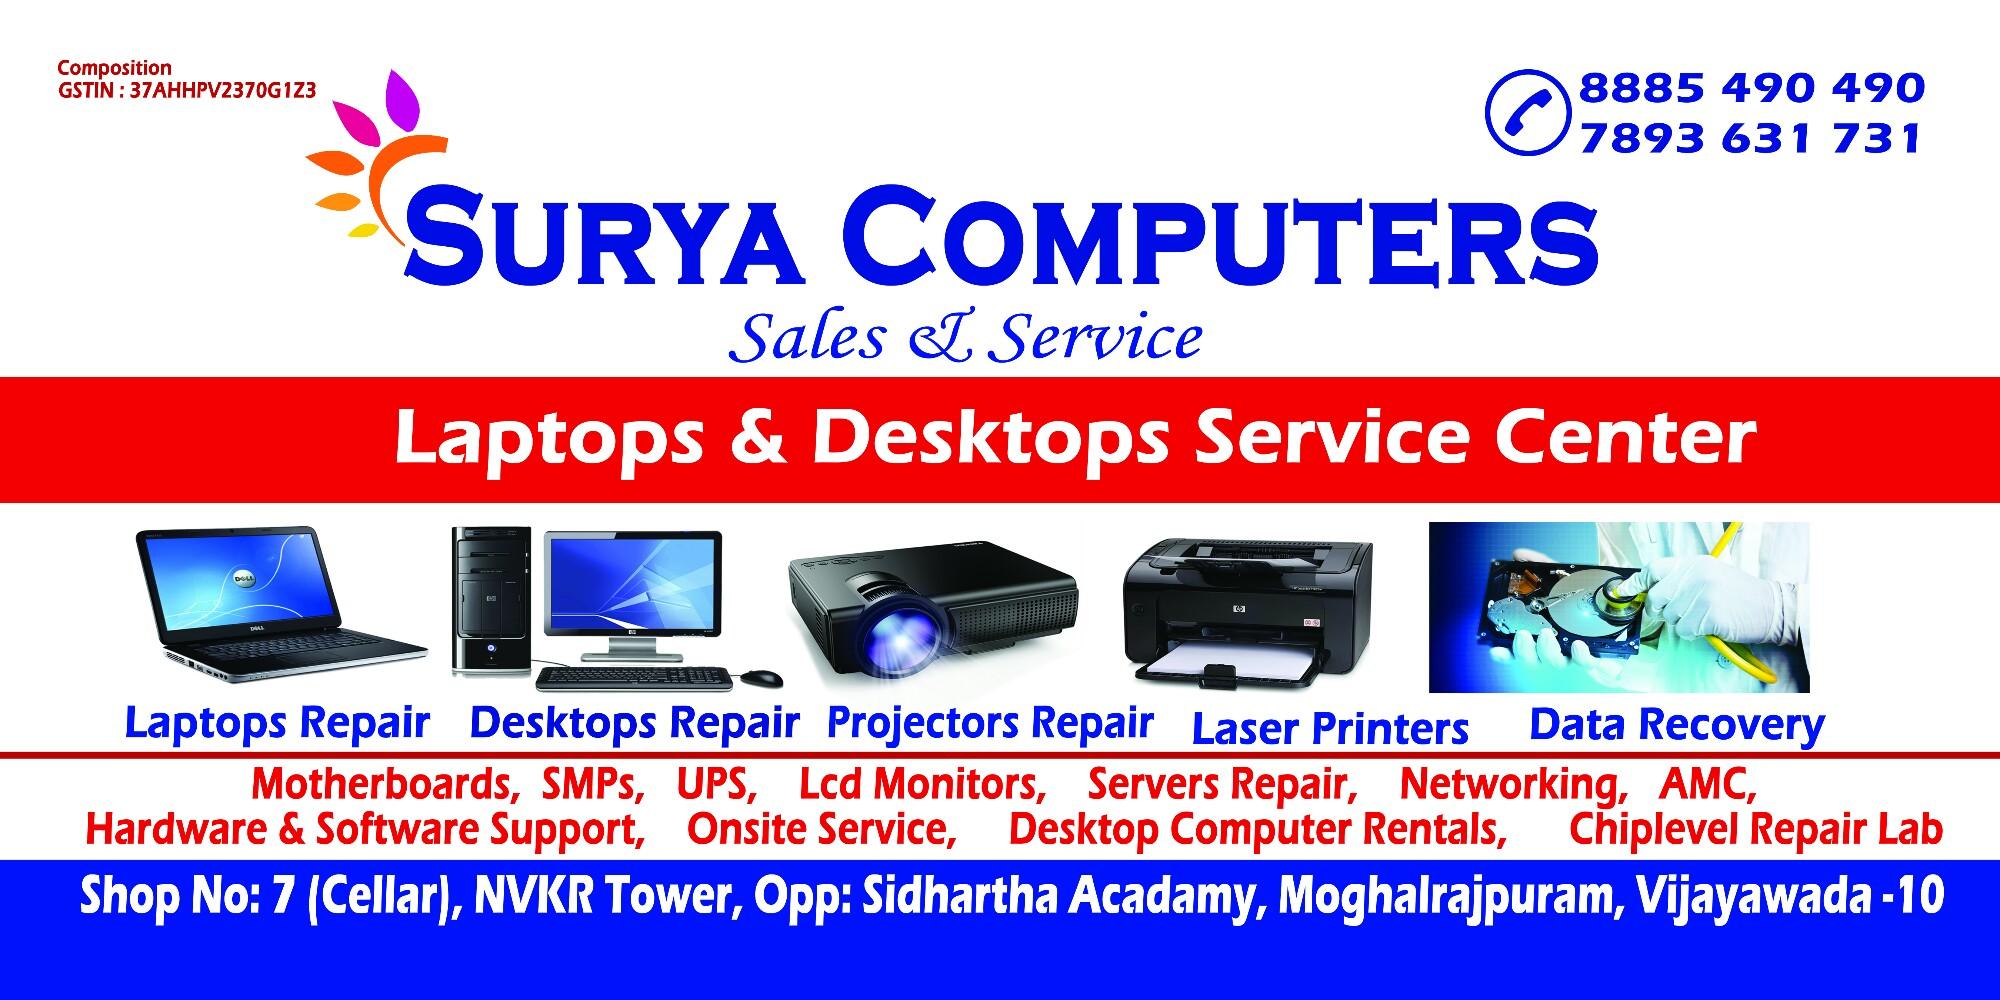 Top 10 Lenovo Laptop Service Center in Vijayawada, Lenovo Repairs